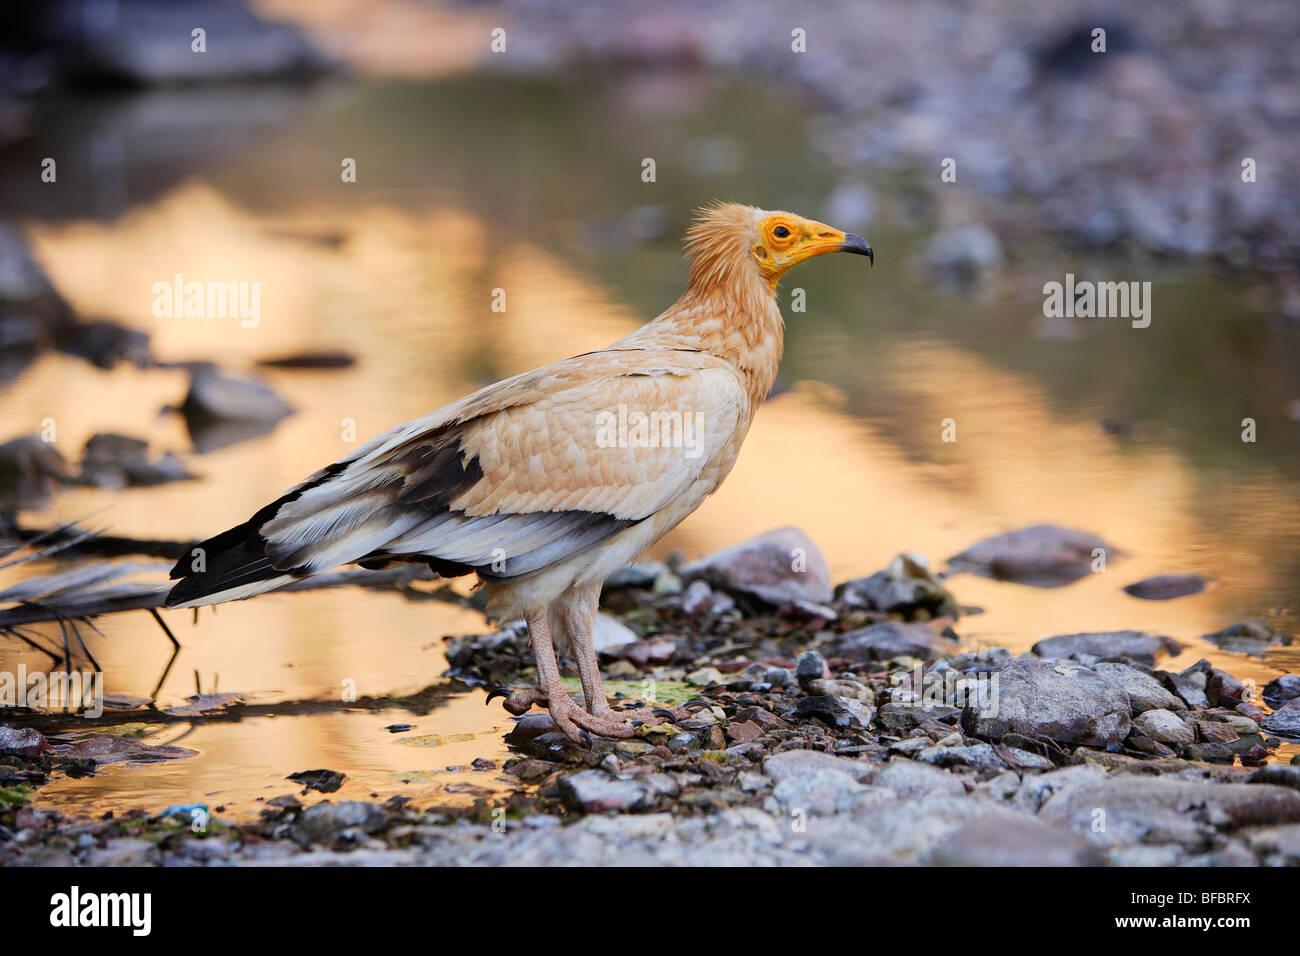 Egyptian Vulture (Neophron percnopterus) drinking water at Wadi Da'arho canyon, Socotra Island, Yemen - Stock Image